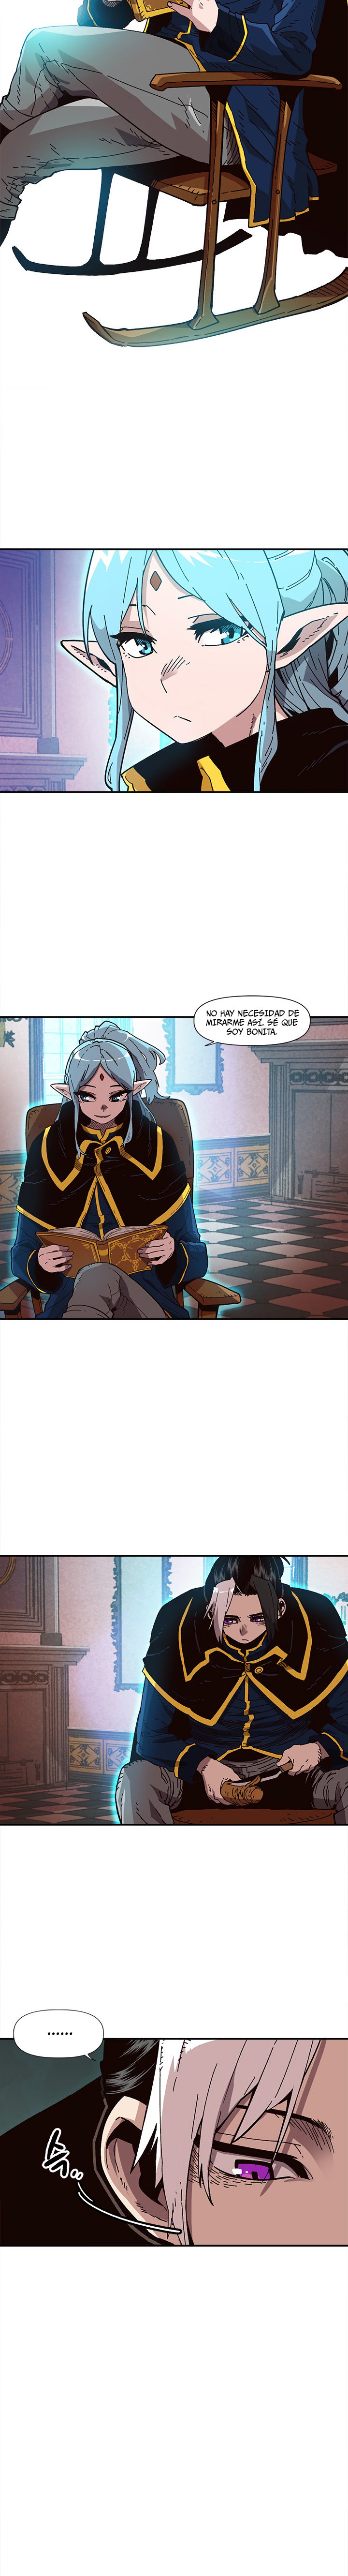 https://nine.mangadogs.com/es_manga/pic9/15/35919/969366/05d287893f5f083739da863da2c4b6f8.jpg Page 3